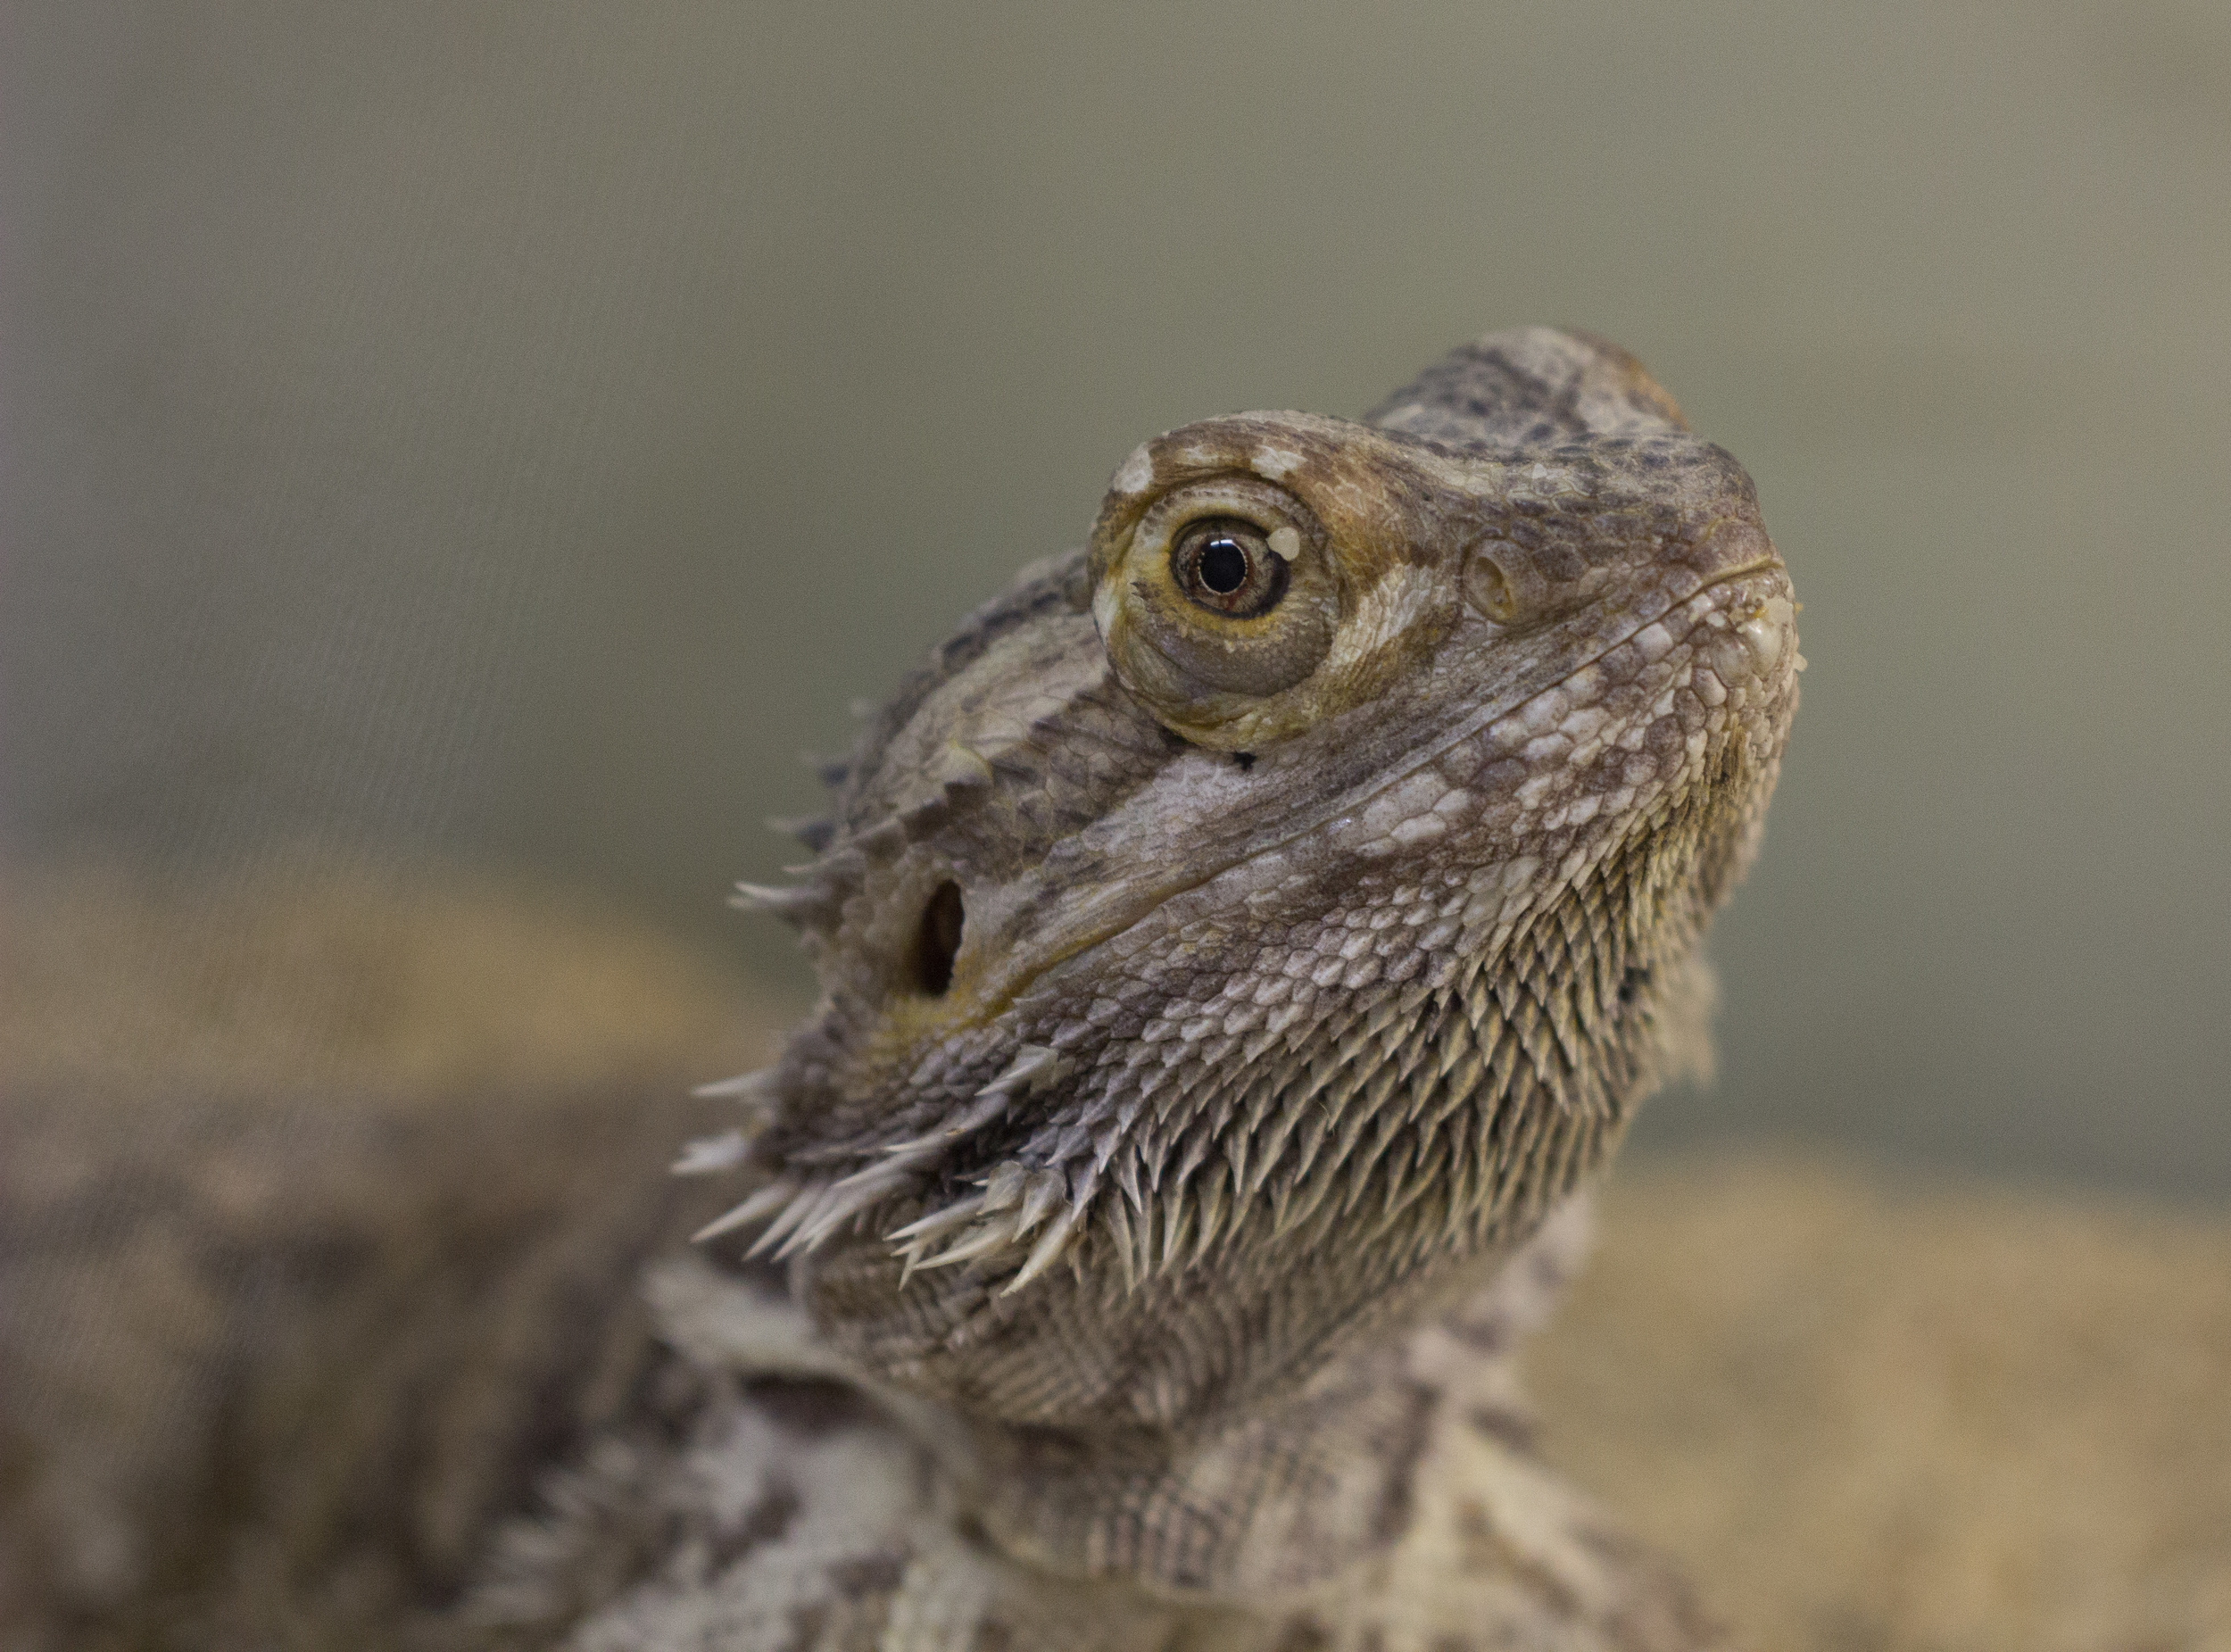 Inland Bearded Dragon (Pogona vitticeps)